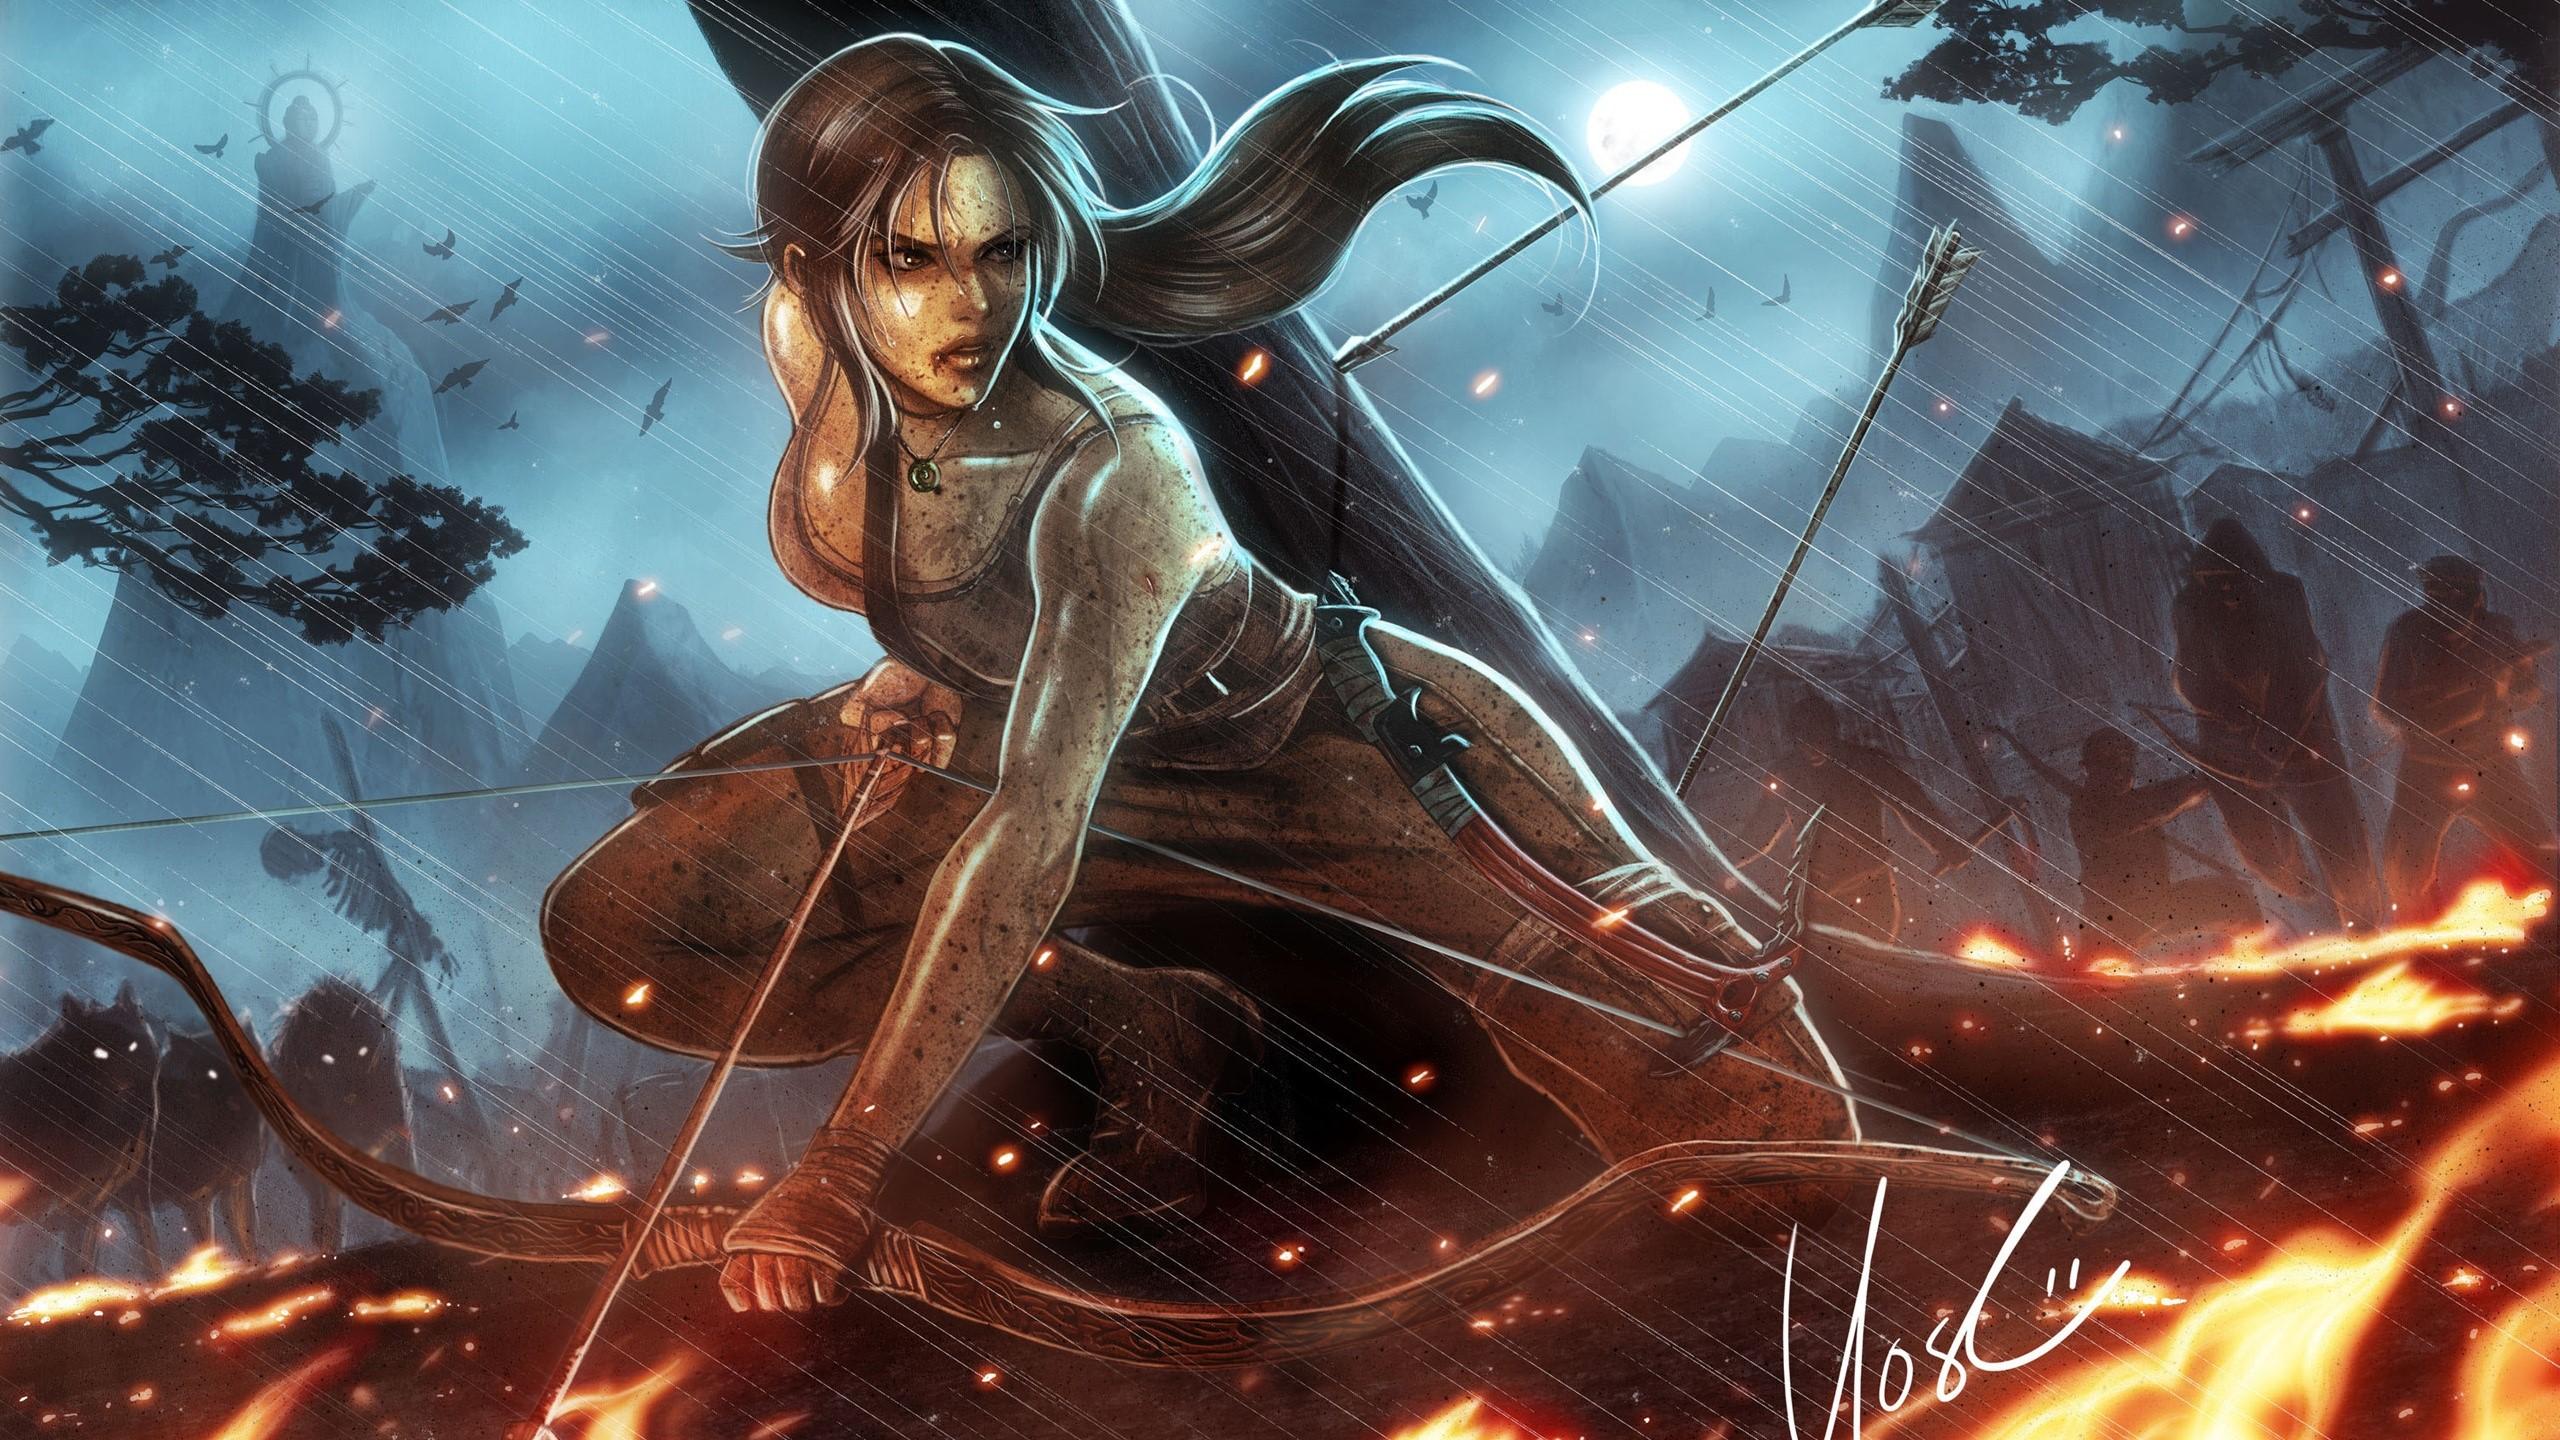 Wallpaper Lara Croft Tomb Raider Reborn